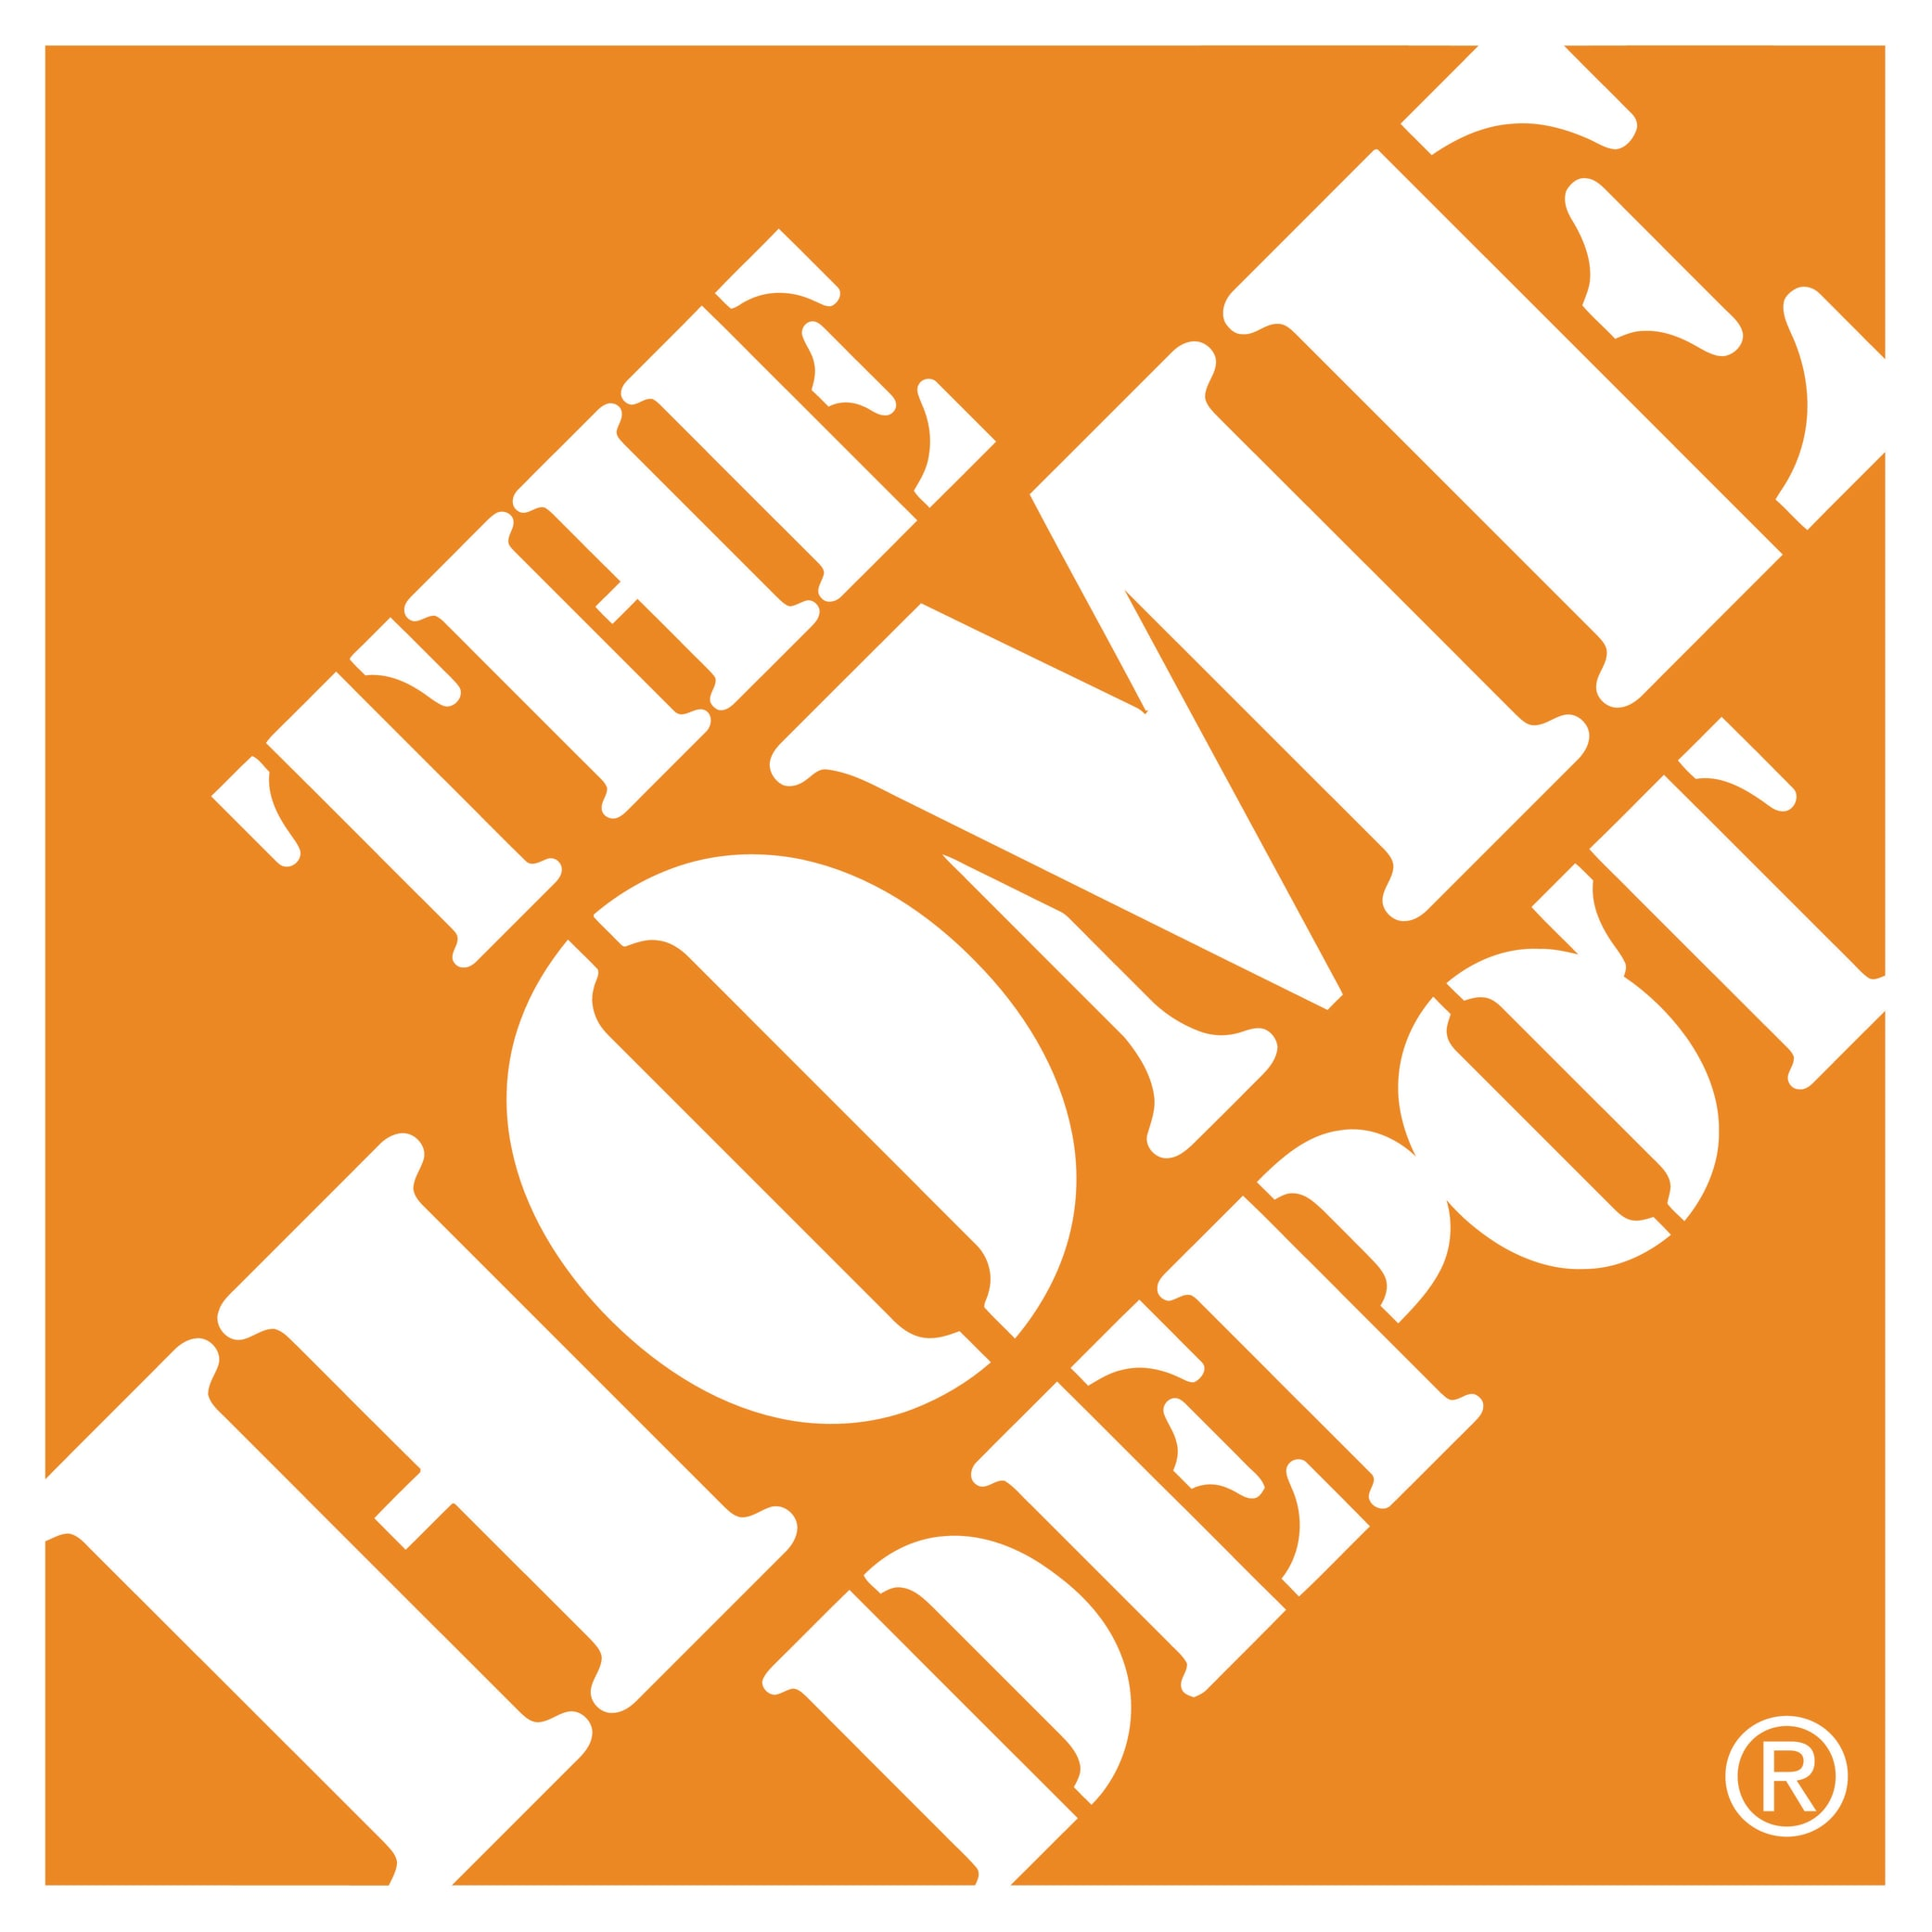 The_Home_Depot-w2083.jpg